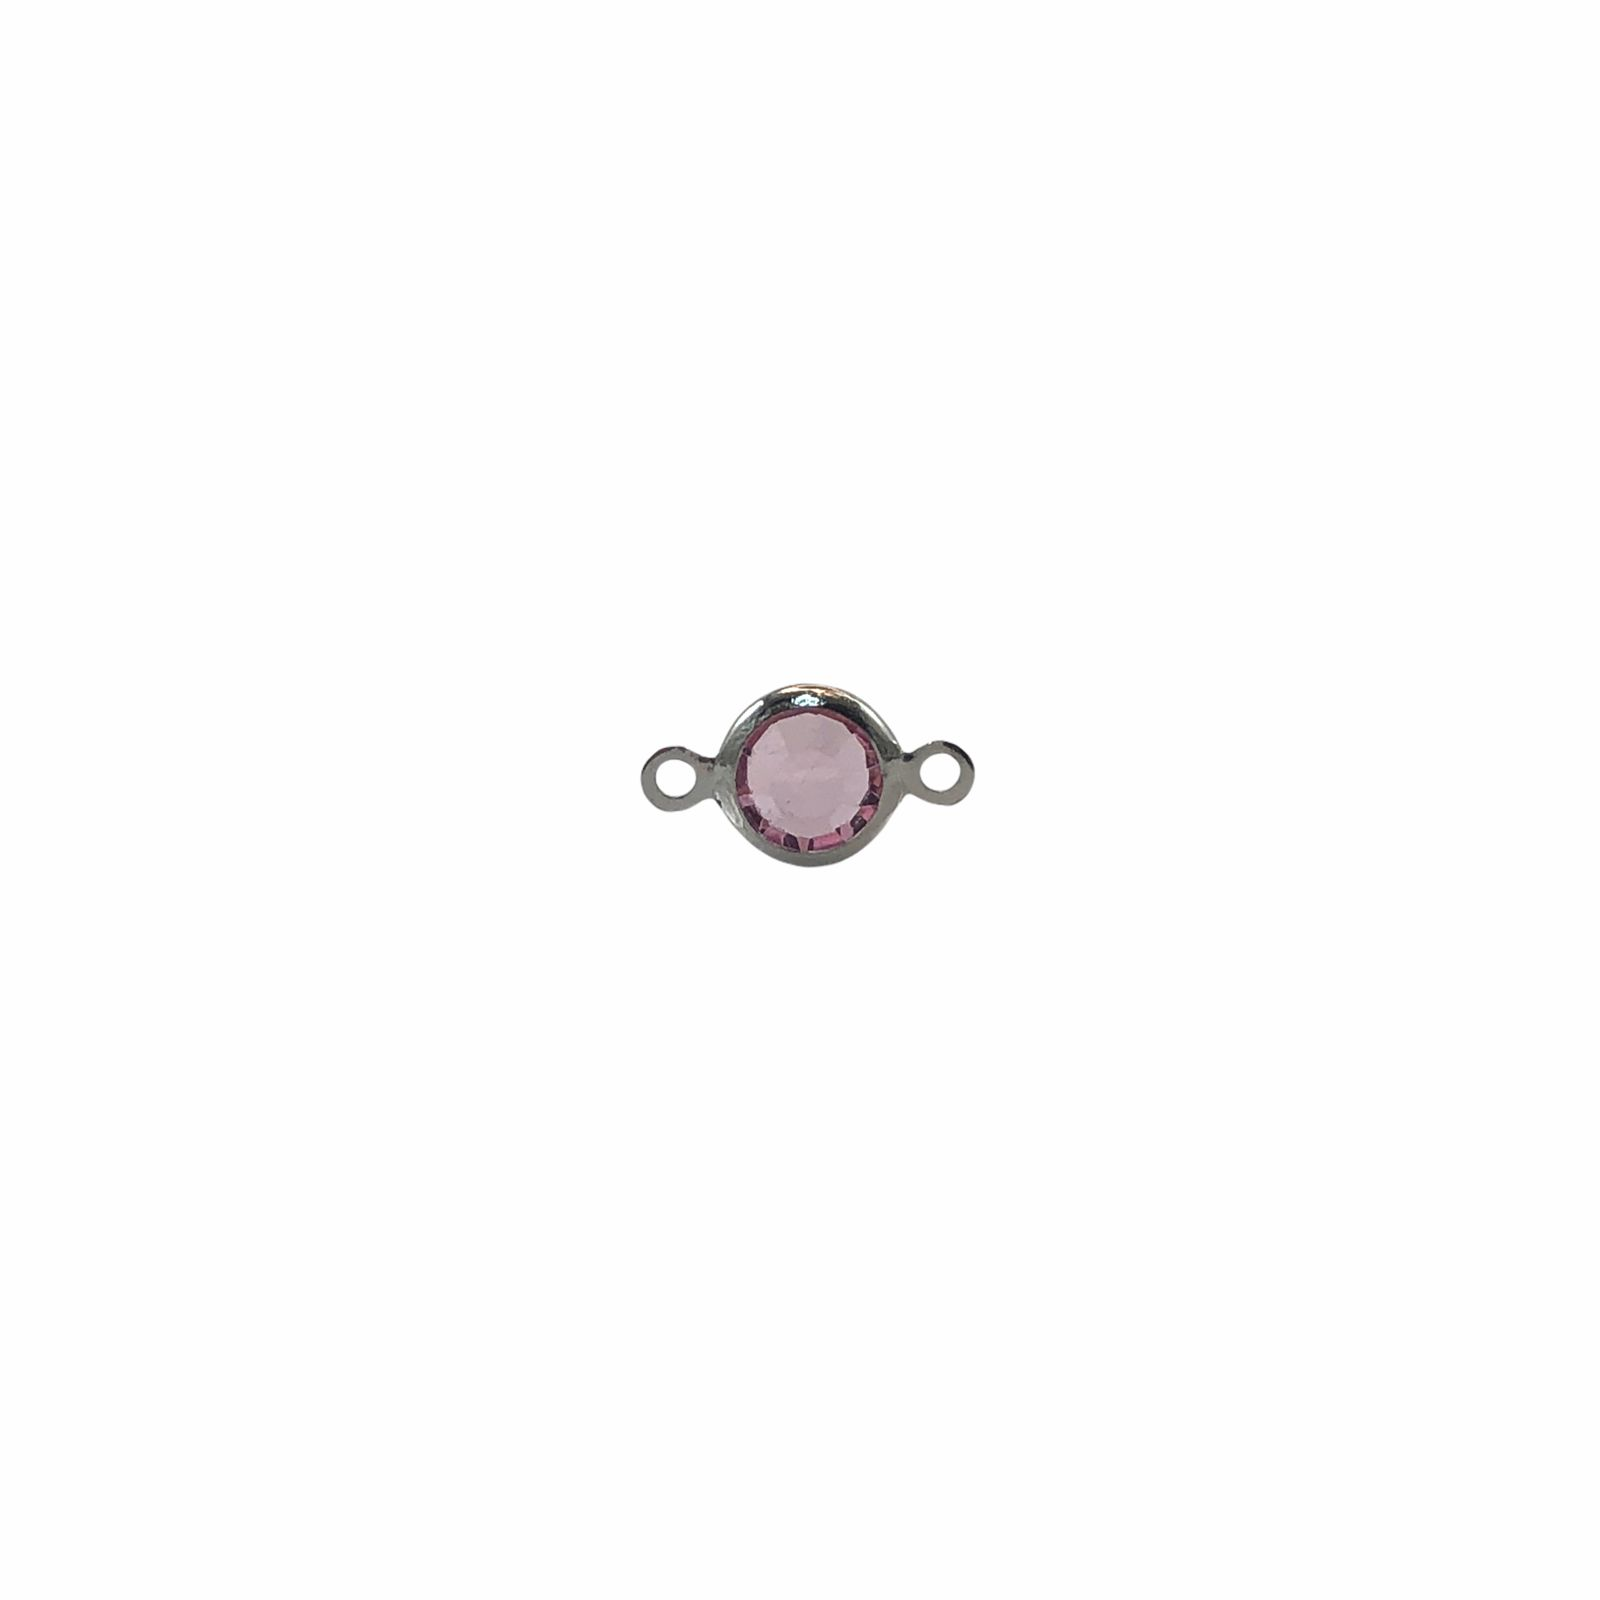 ETM608 - Entremeio De Vidro Rose 8mm Banhado Cor Prata - 4Unids